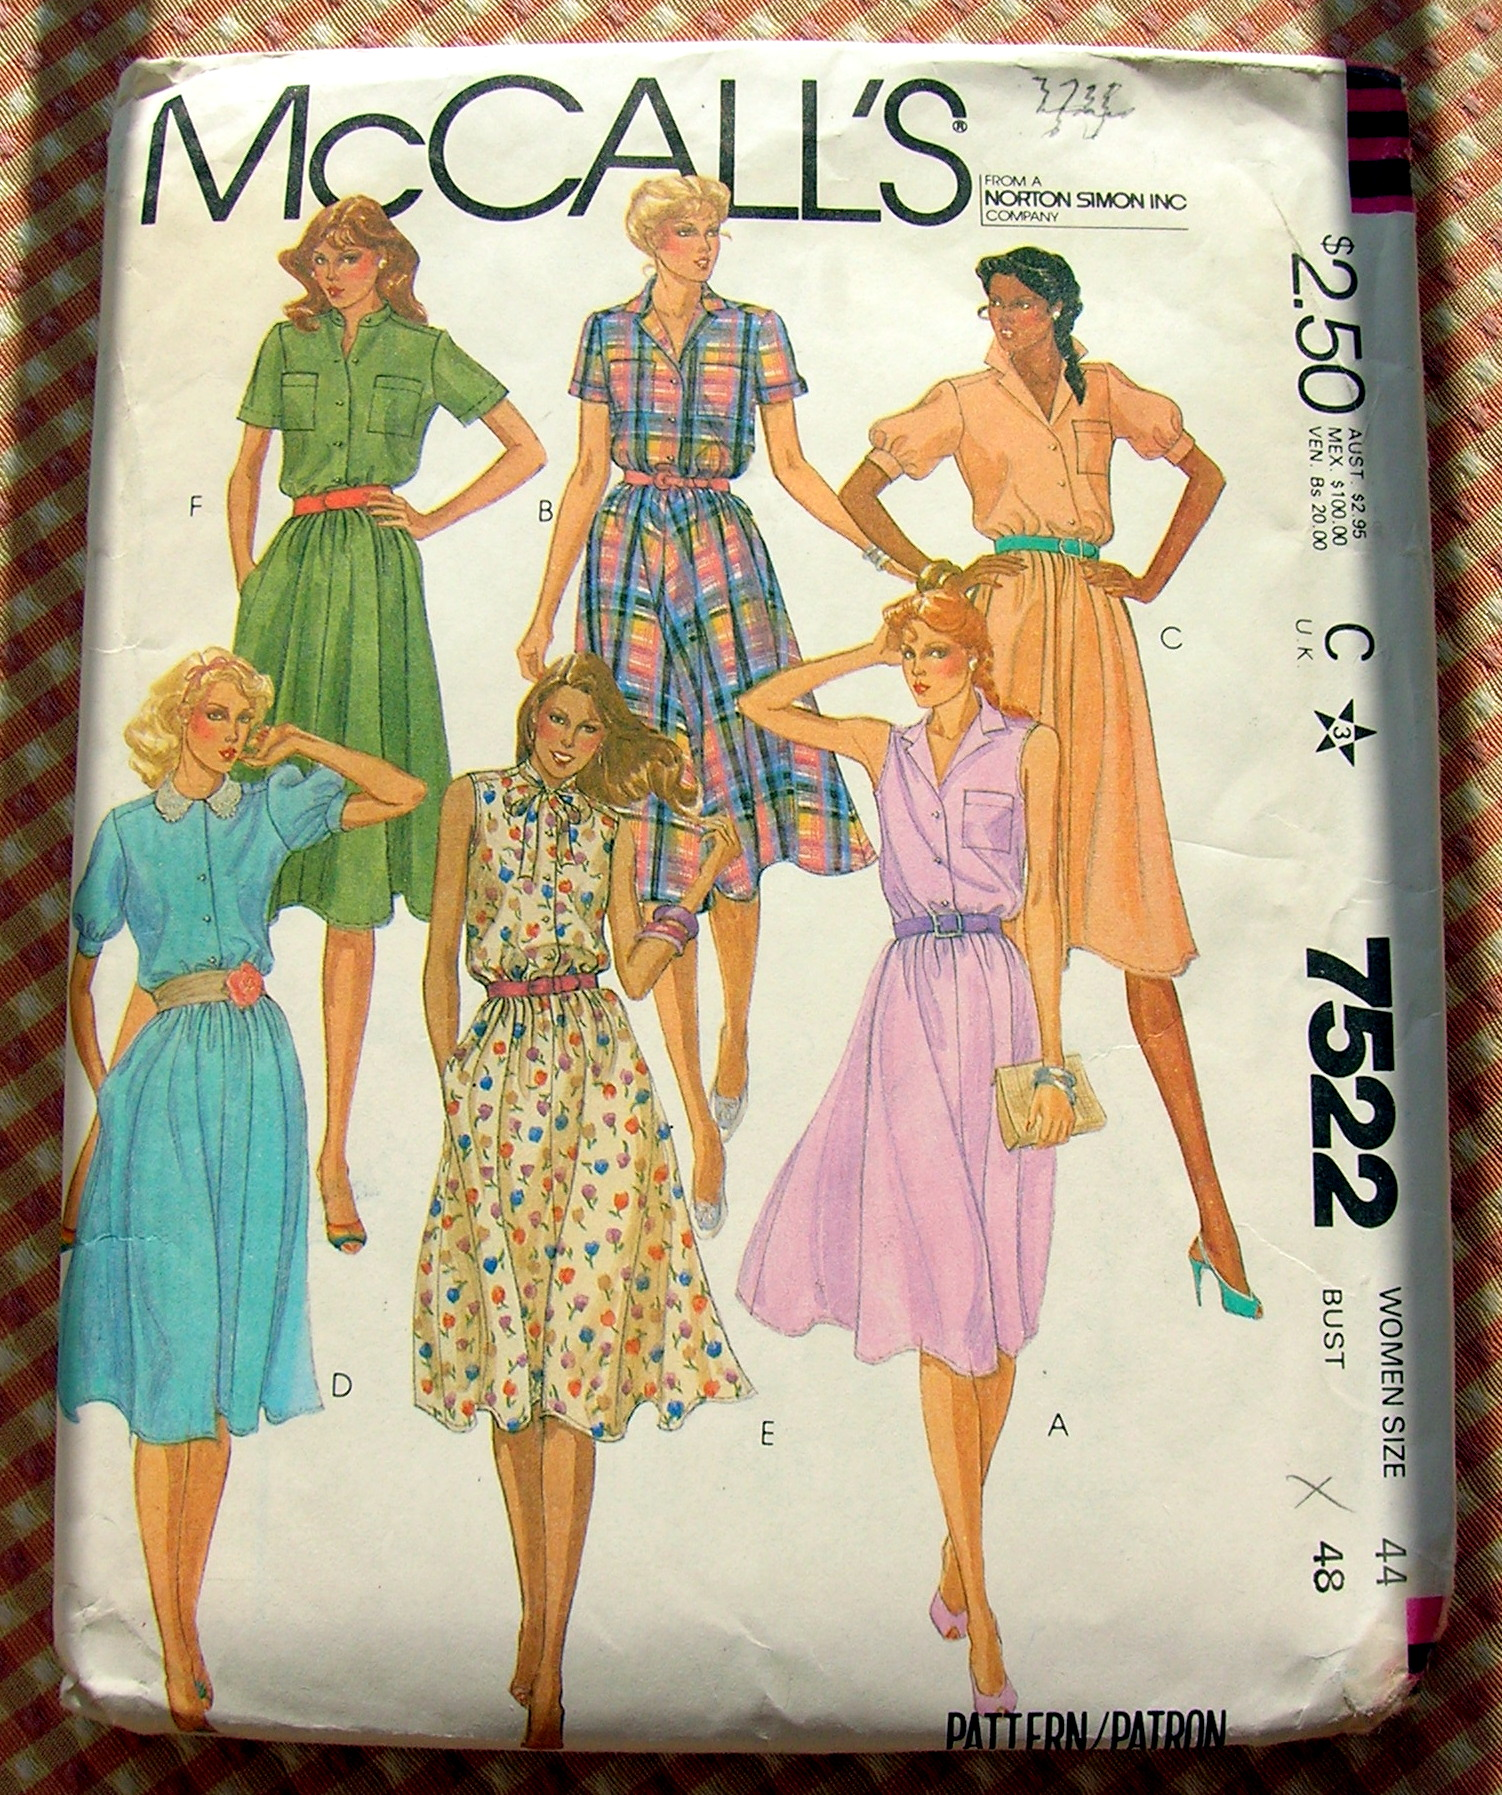 McCall's 7522 A